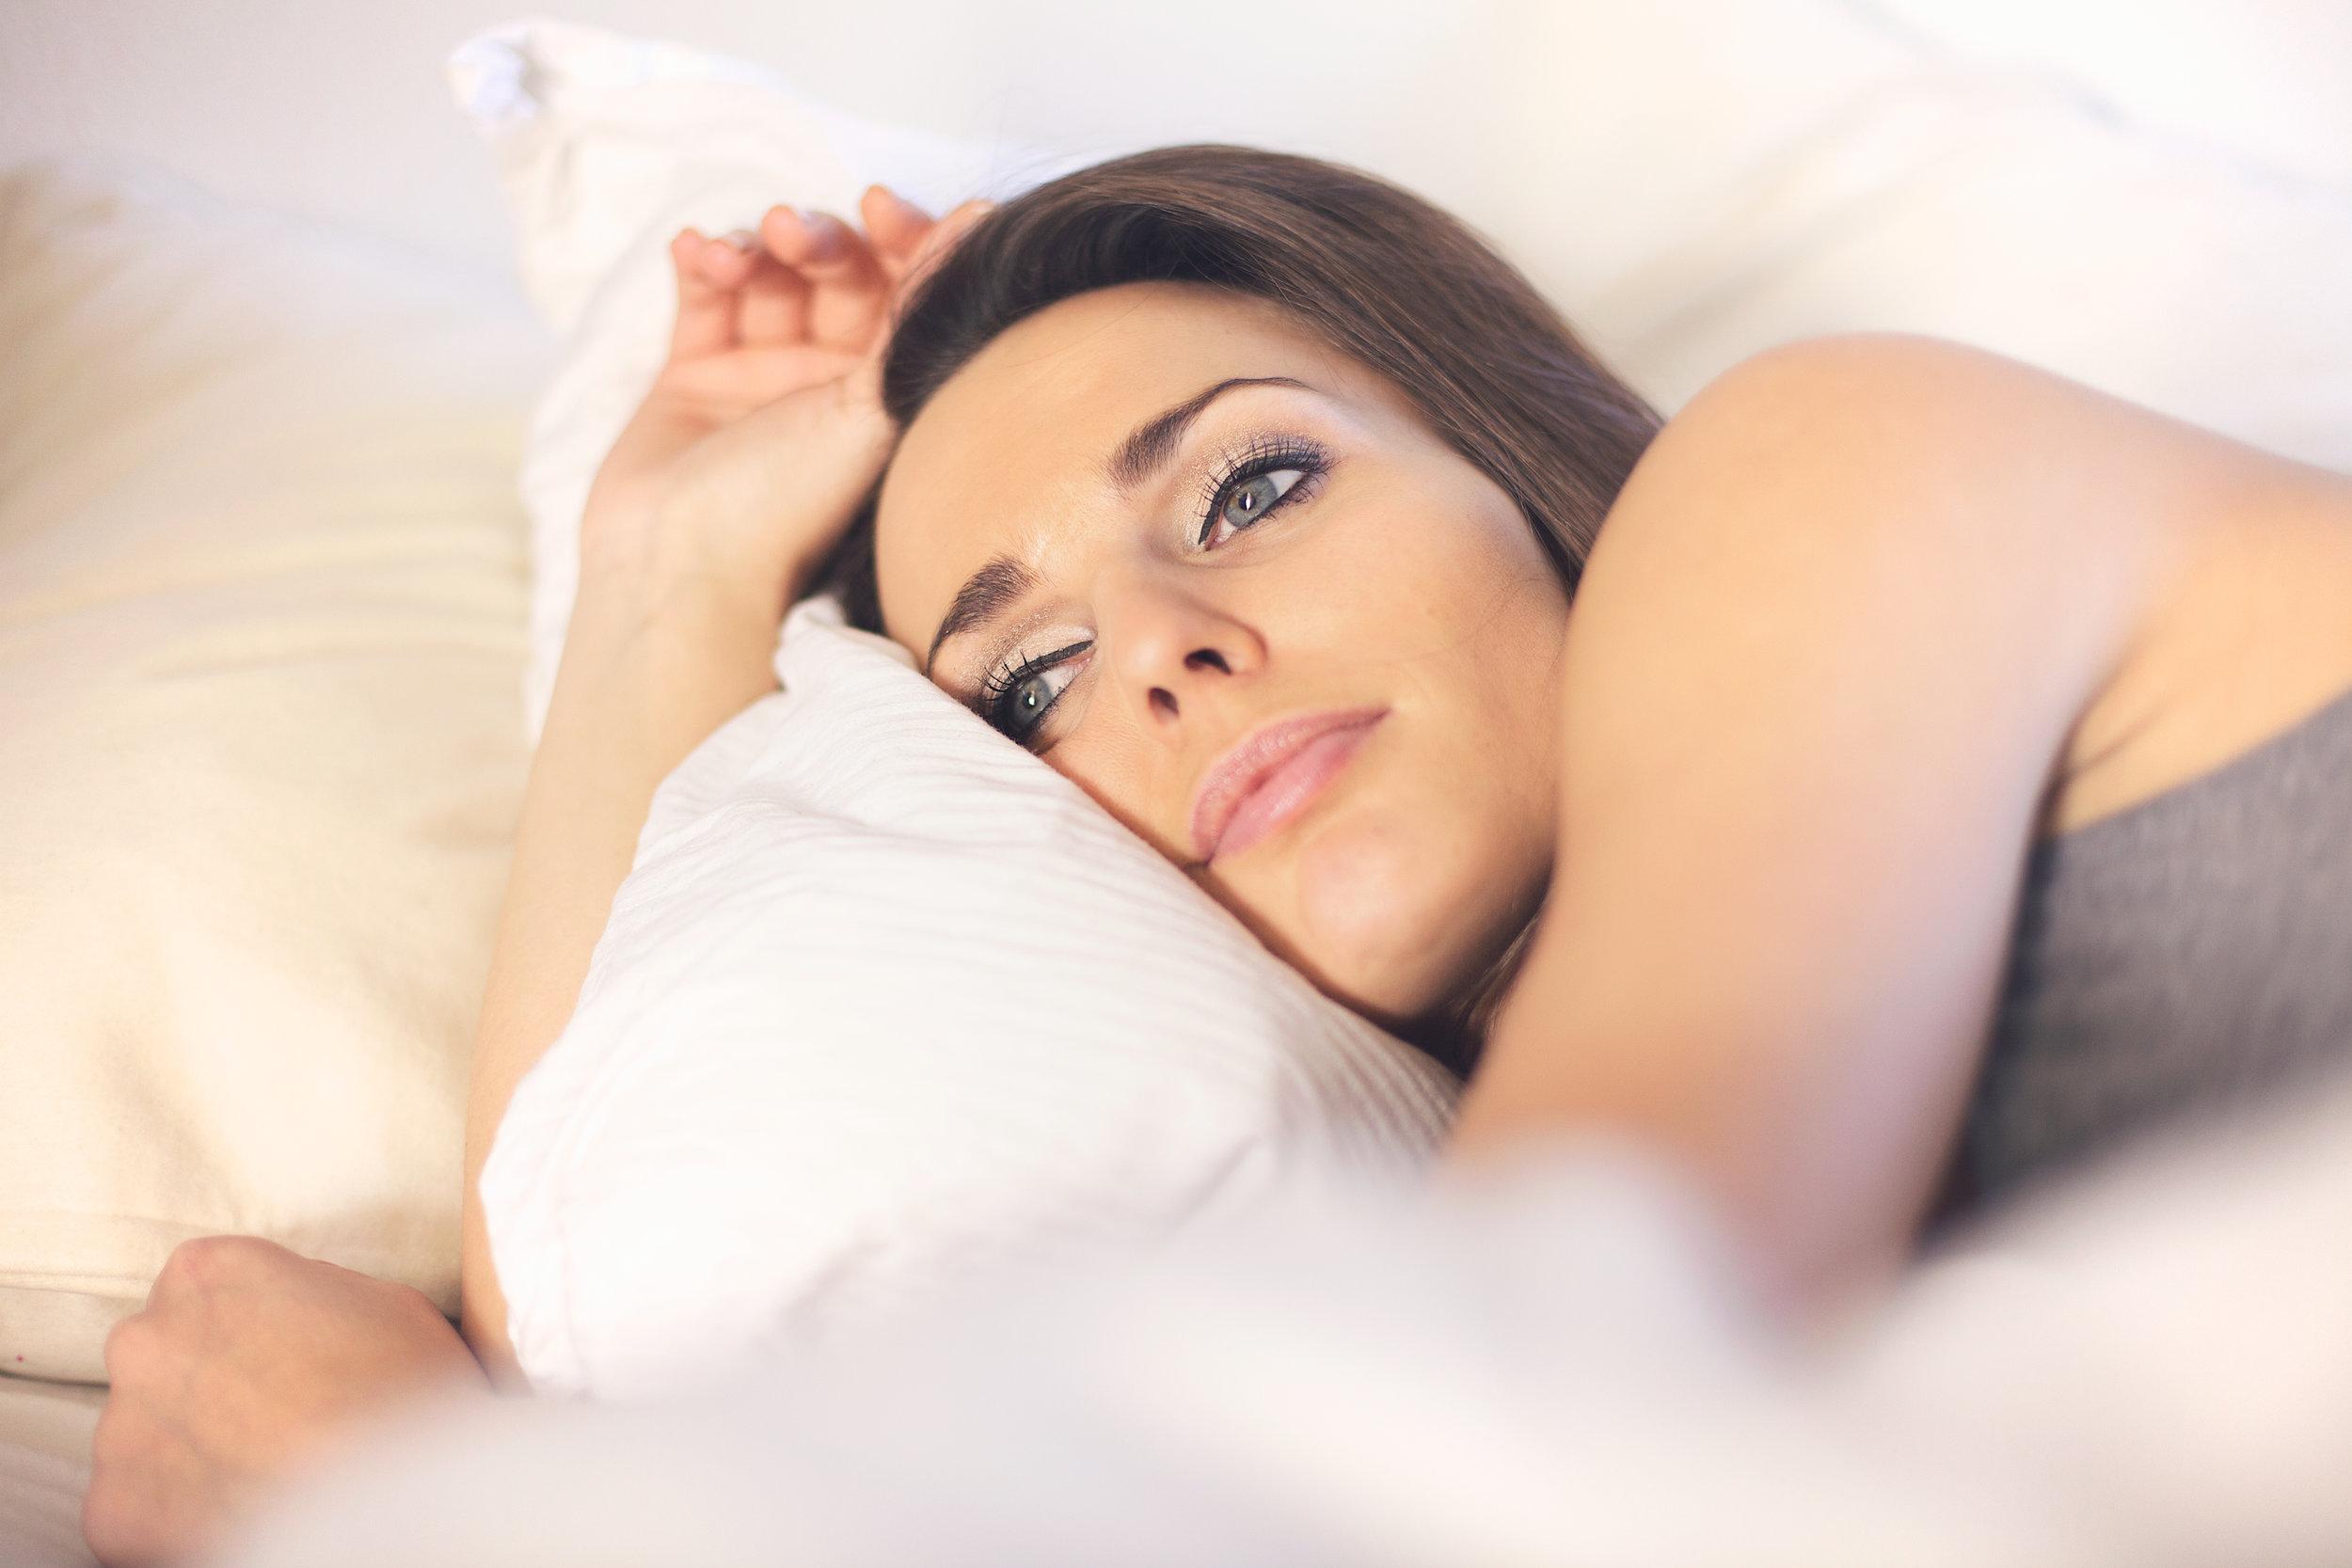 woman with poor or bad sleep habits or hygiene.jpg